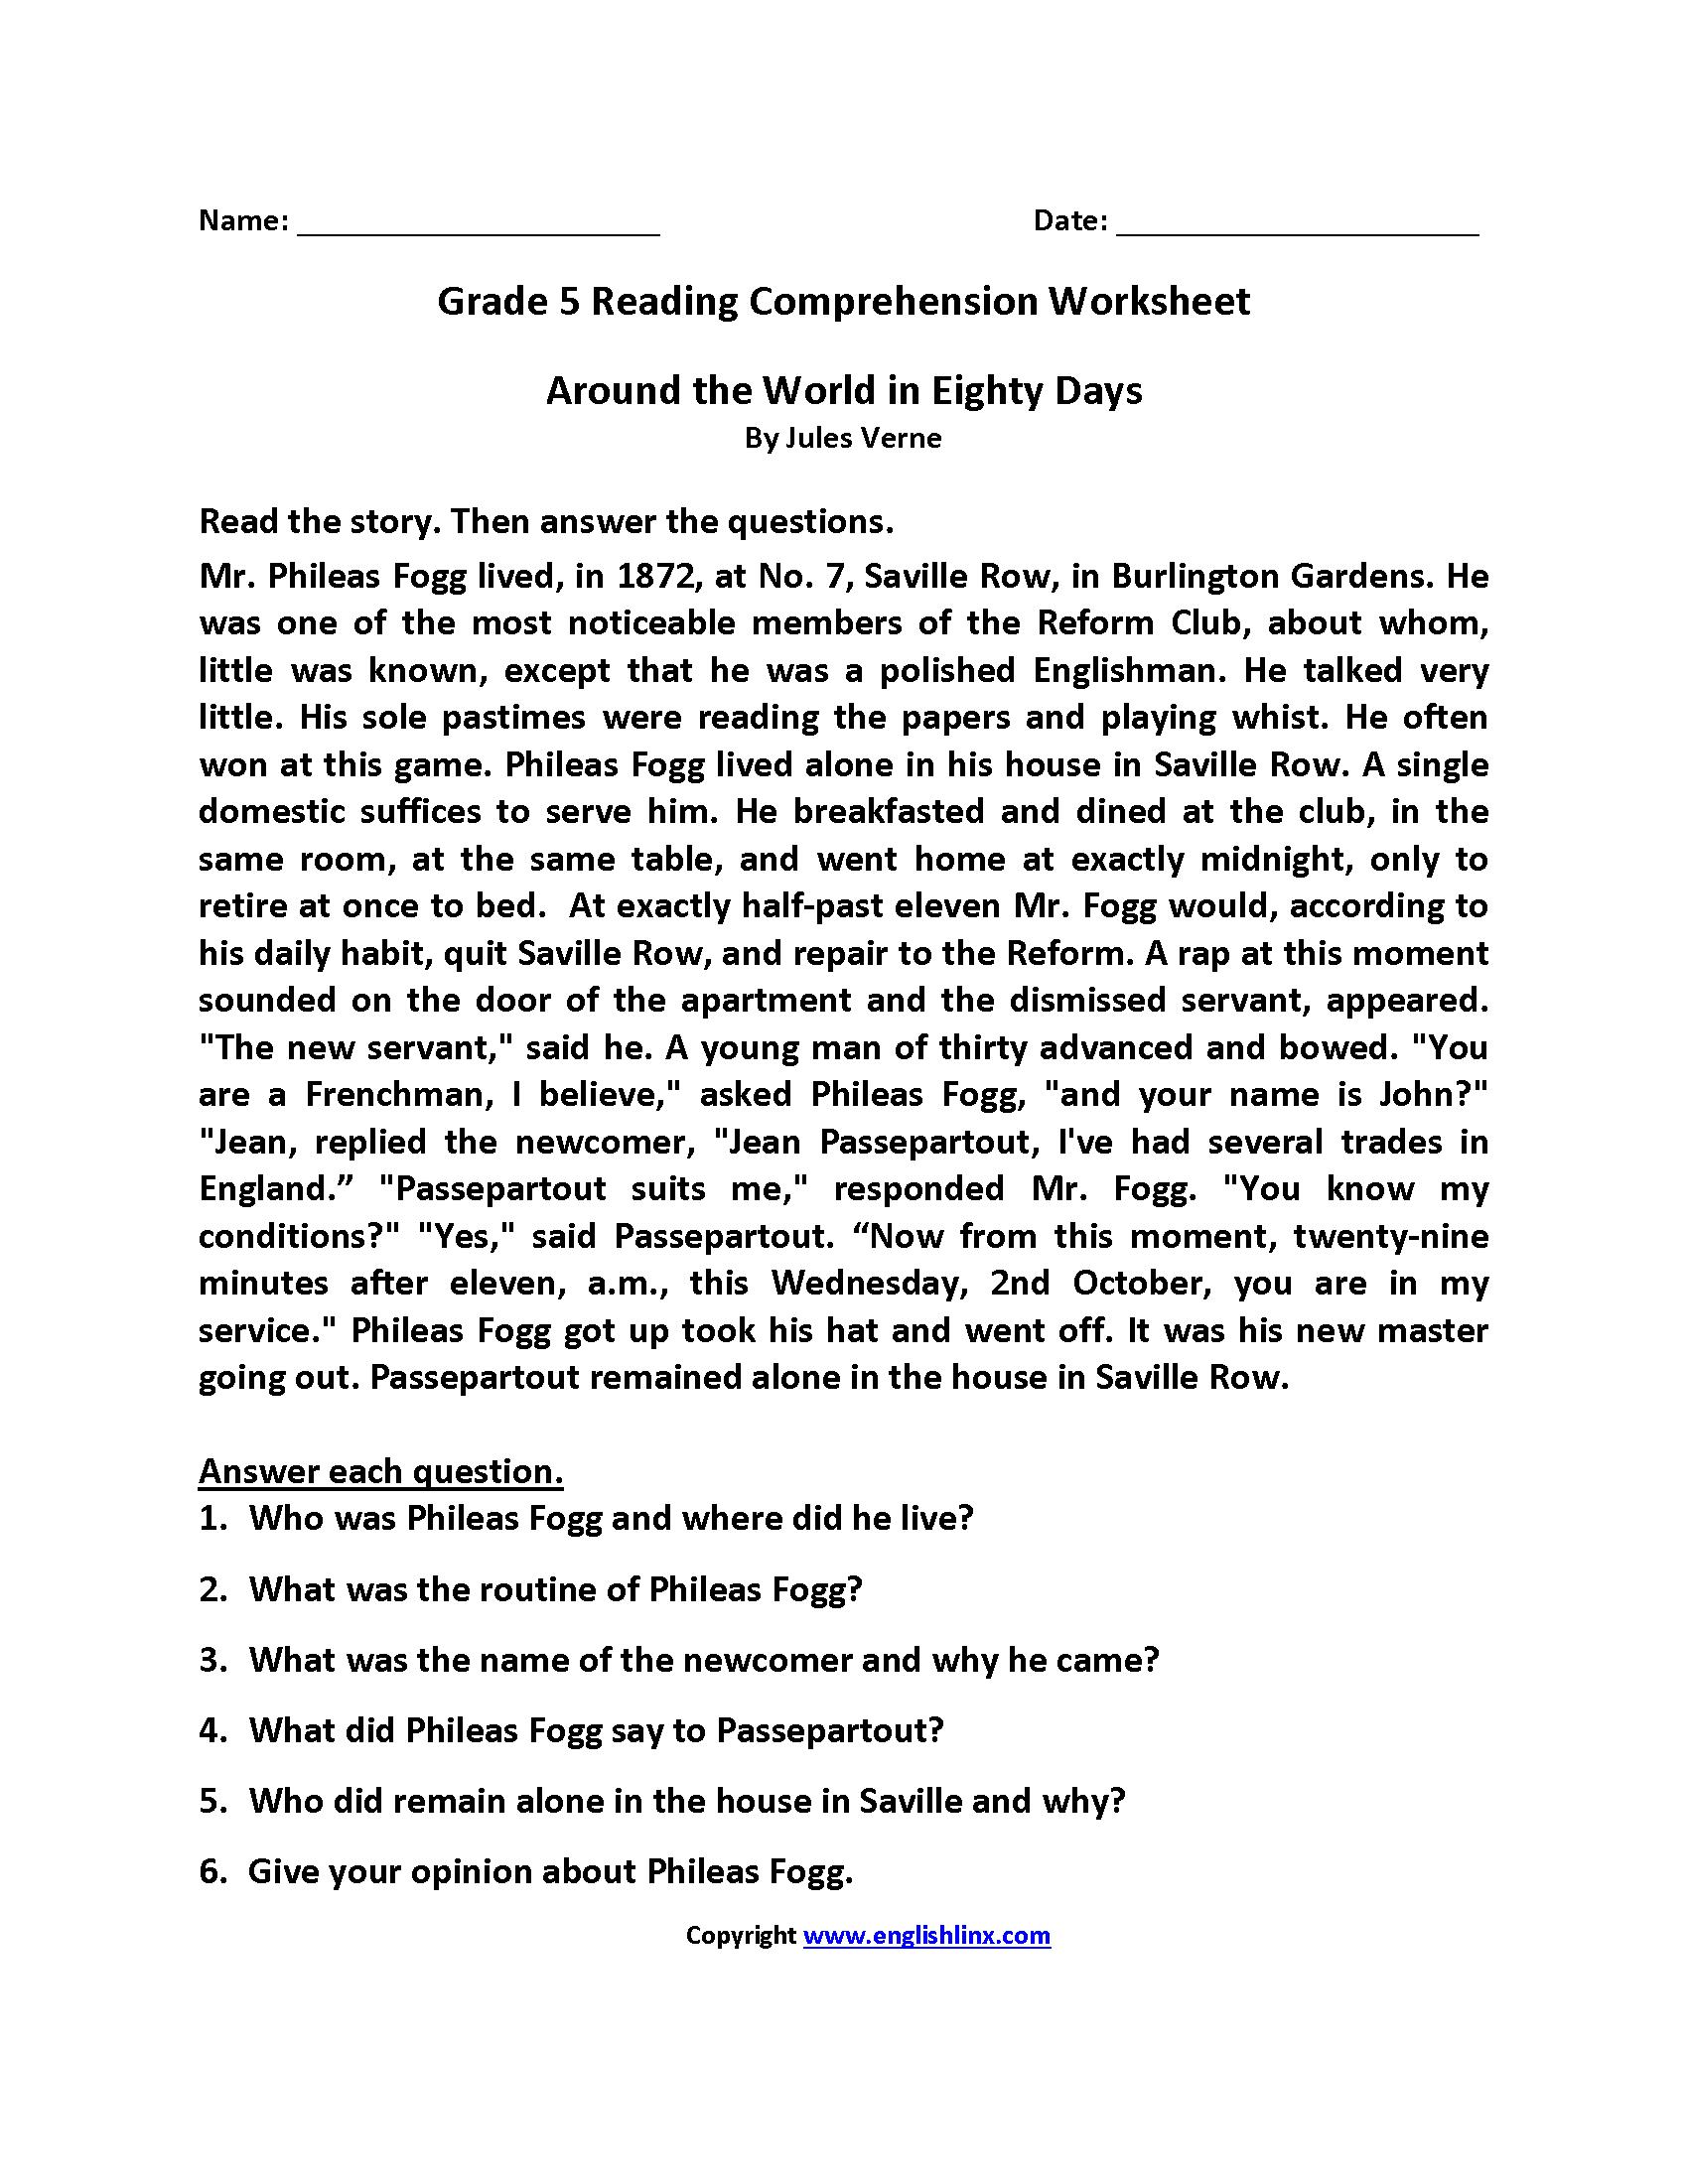 Reading Worksheets | Fifth Grade Reading Worksheets - Free Printable Reading Worksheets For 5Th Grade